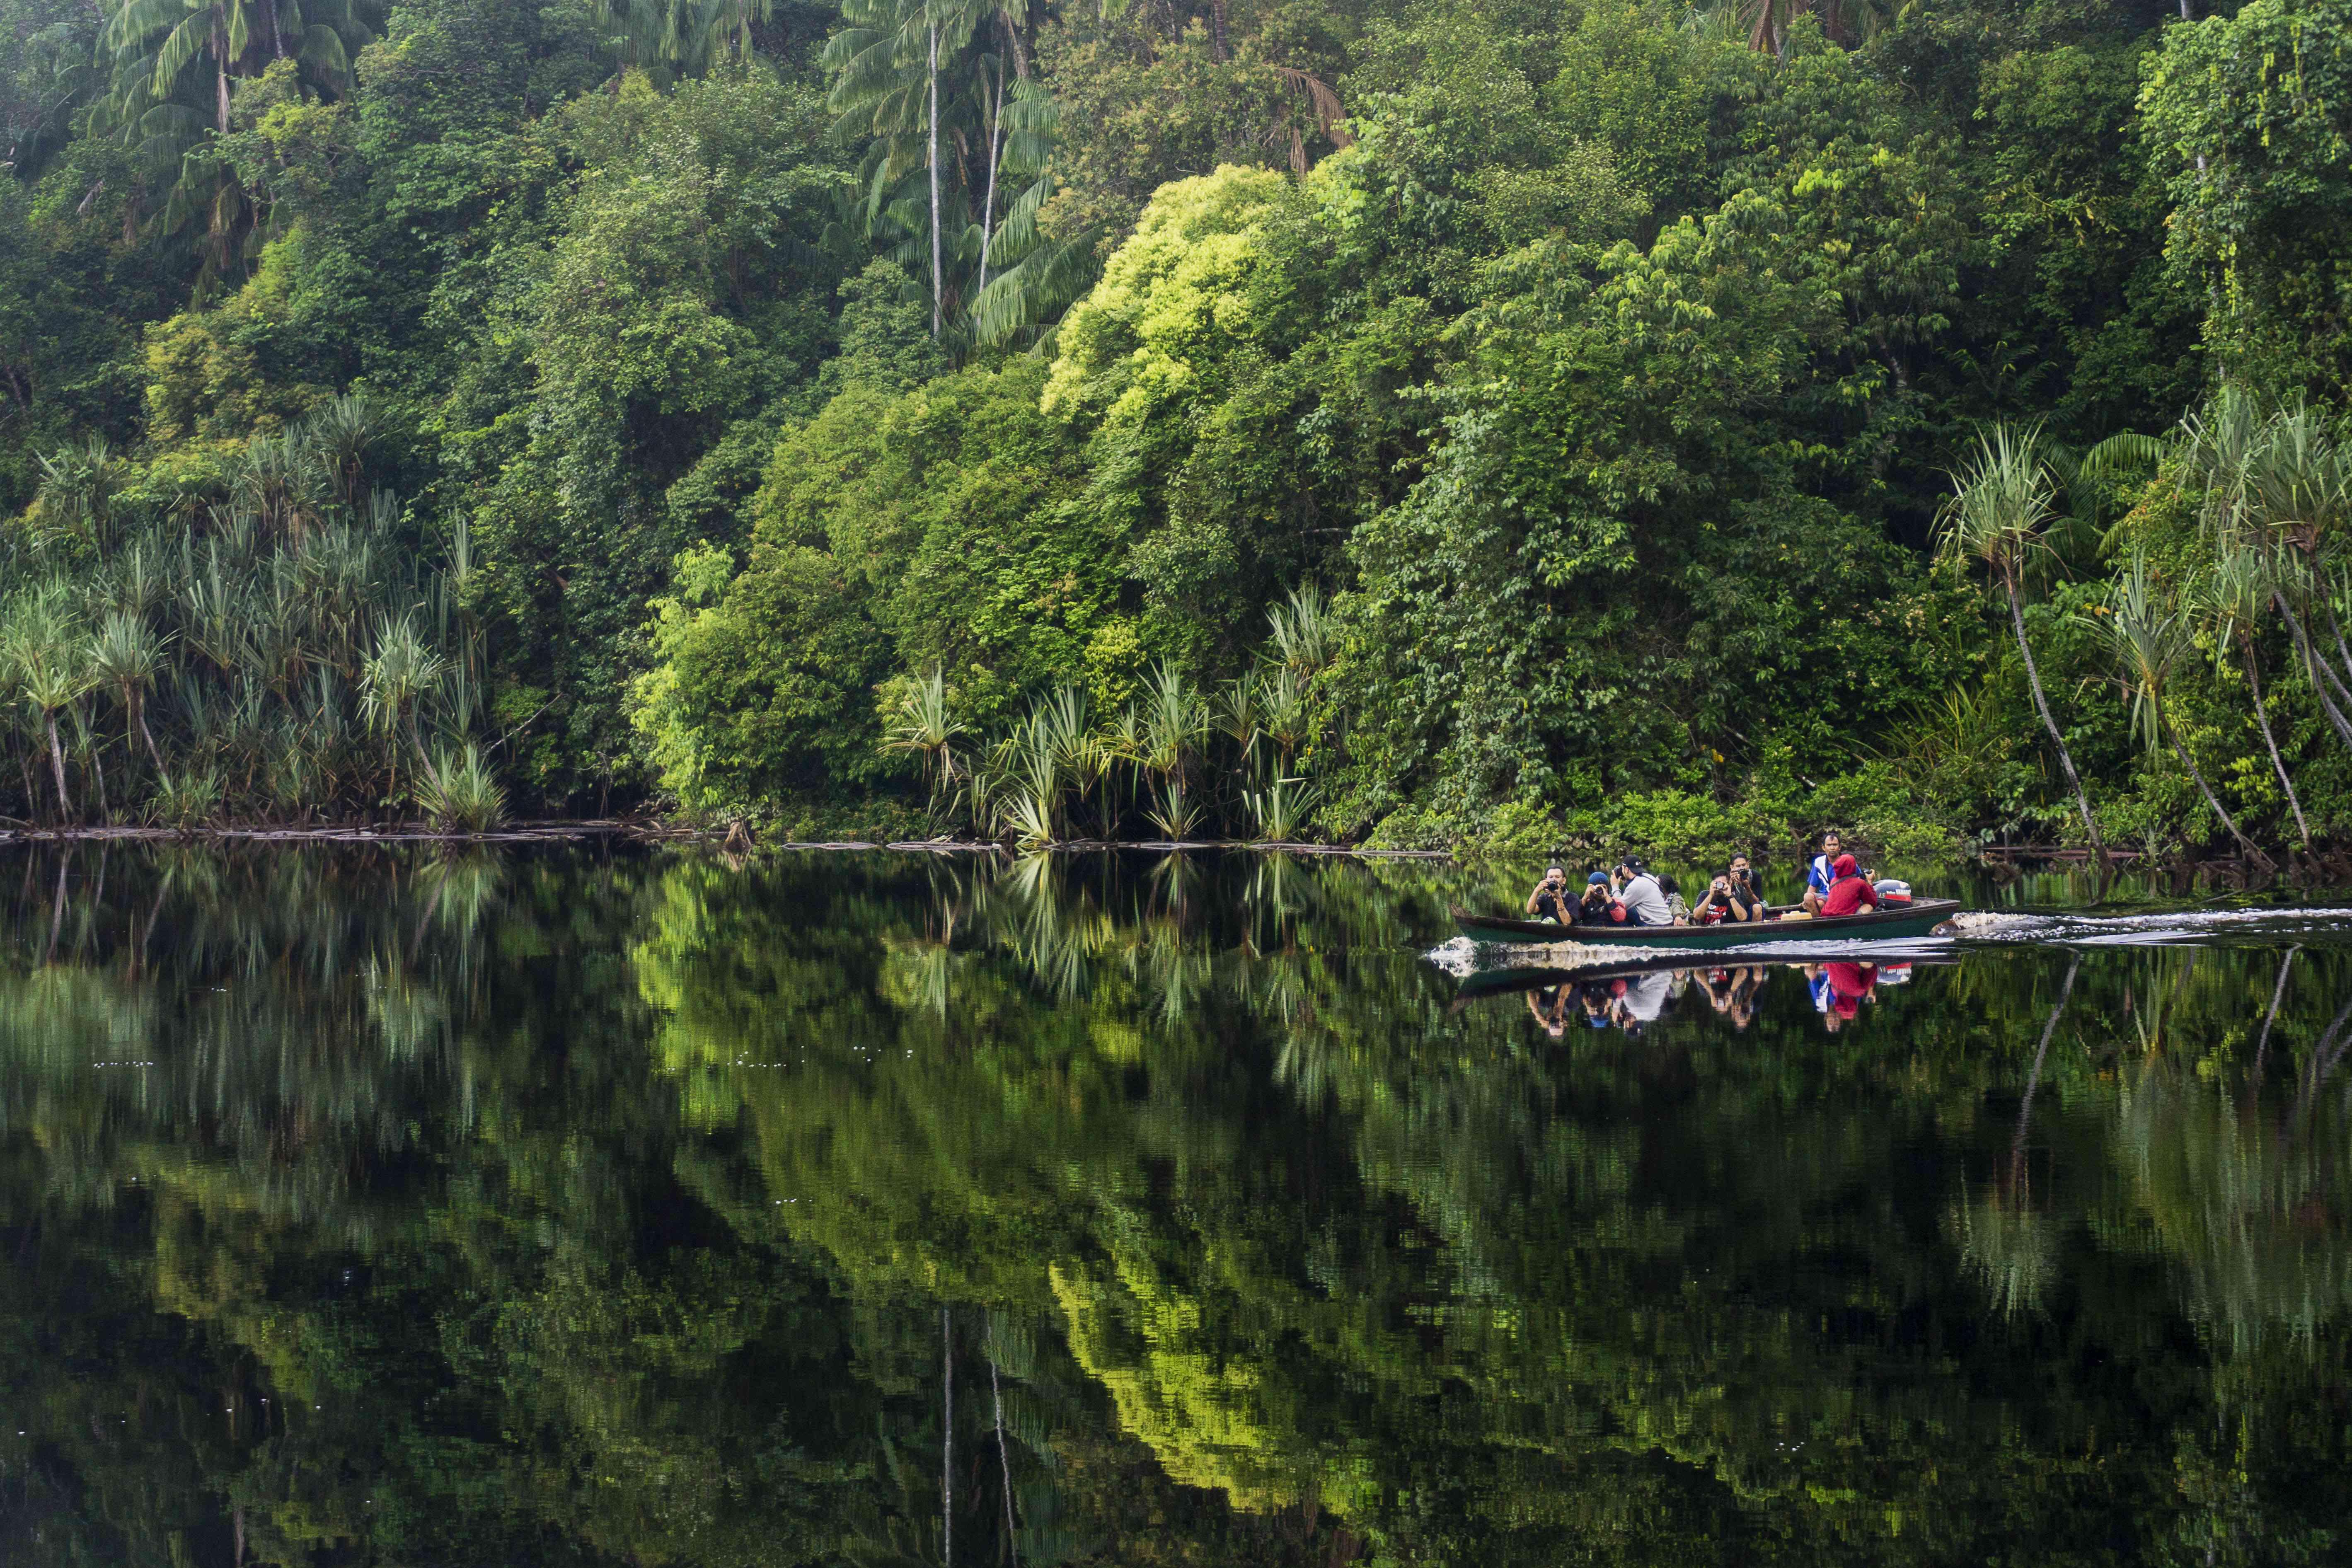 Tourists in a boat exploring Berbak National Park in Sumatra